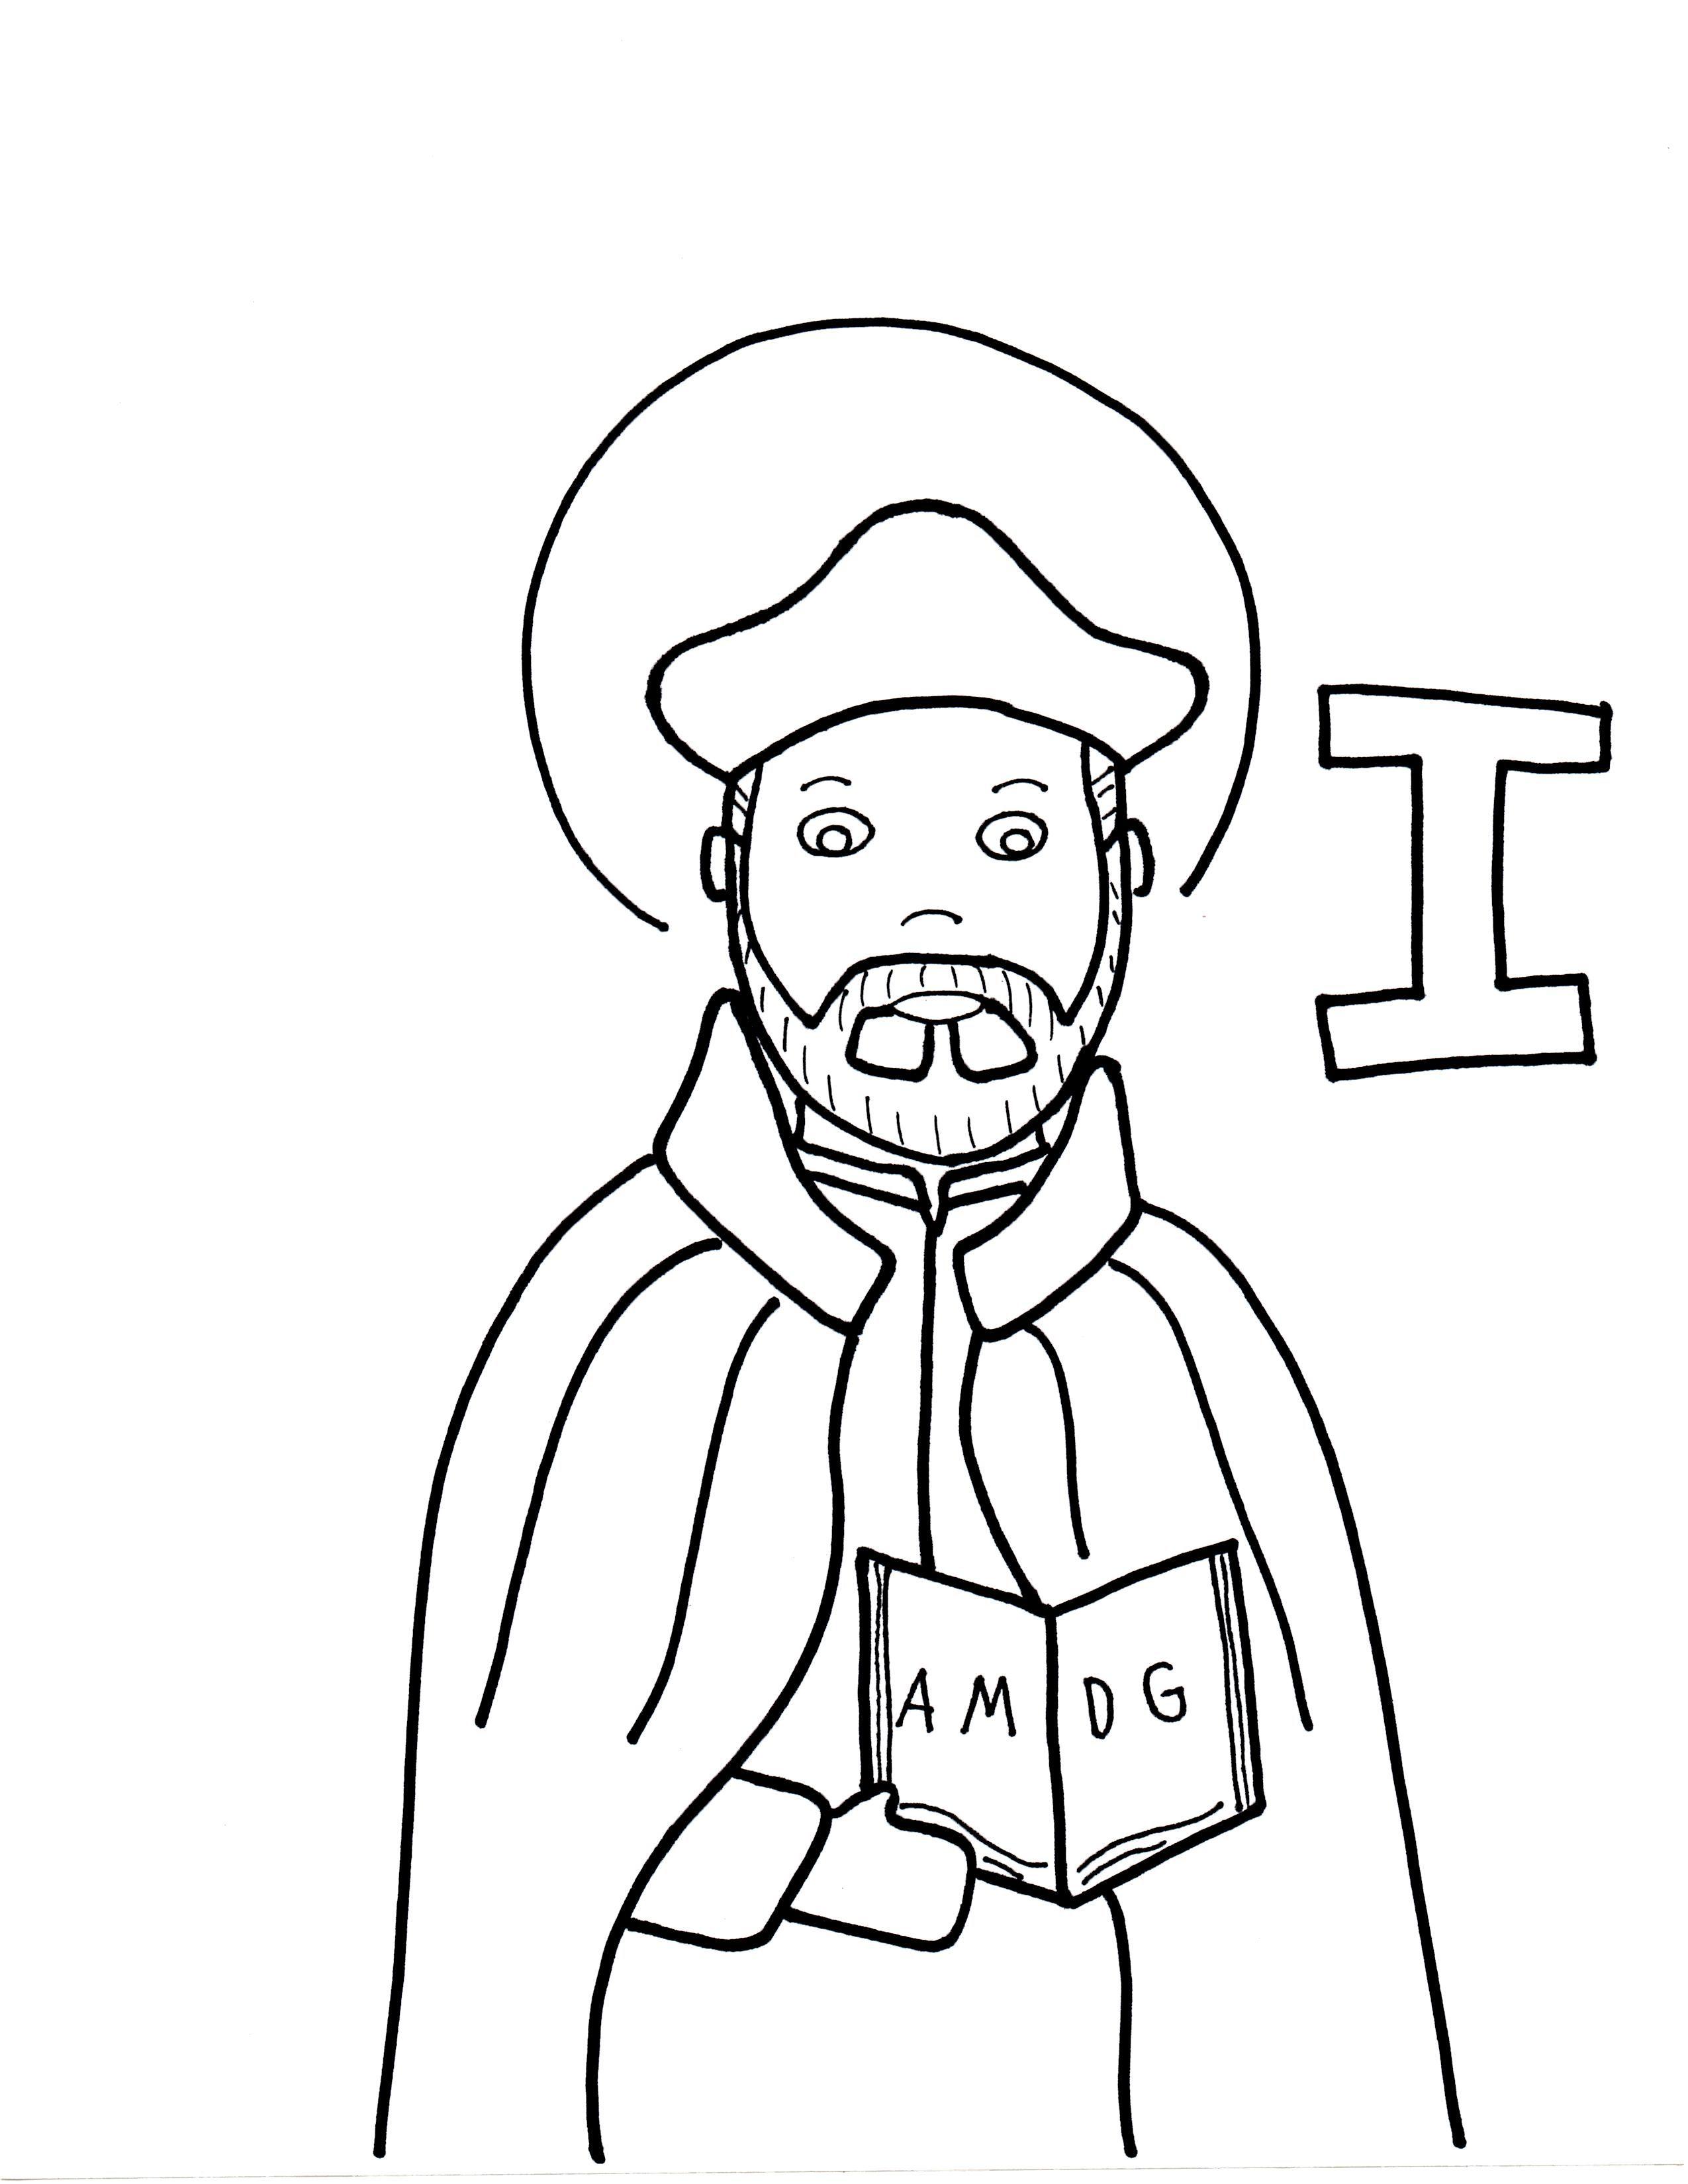 I is for St. Ignatius Loyola